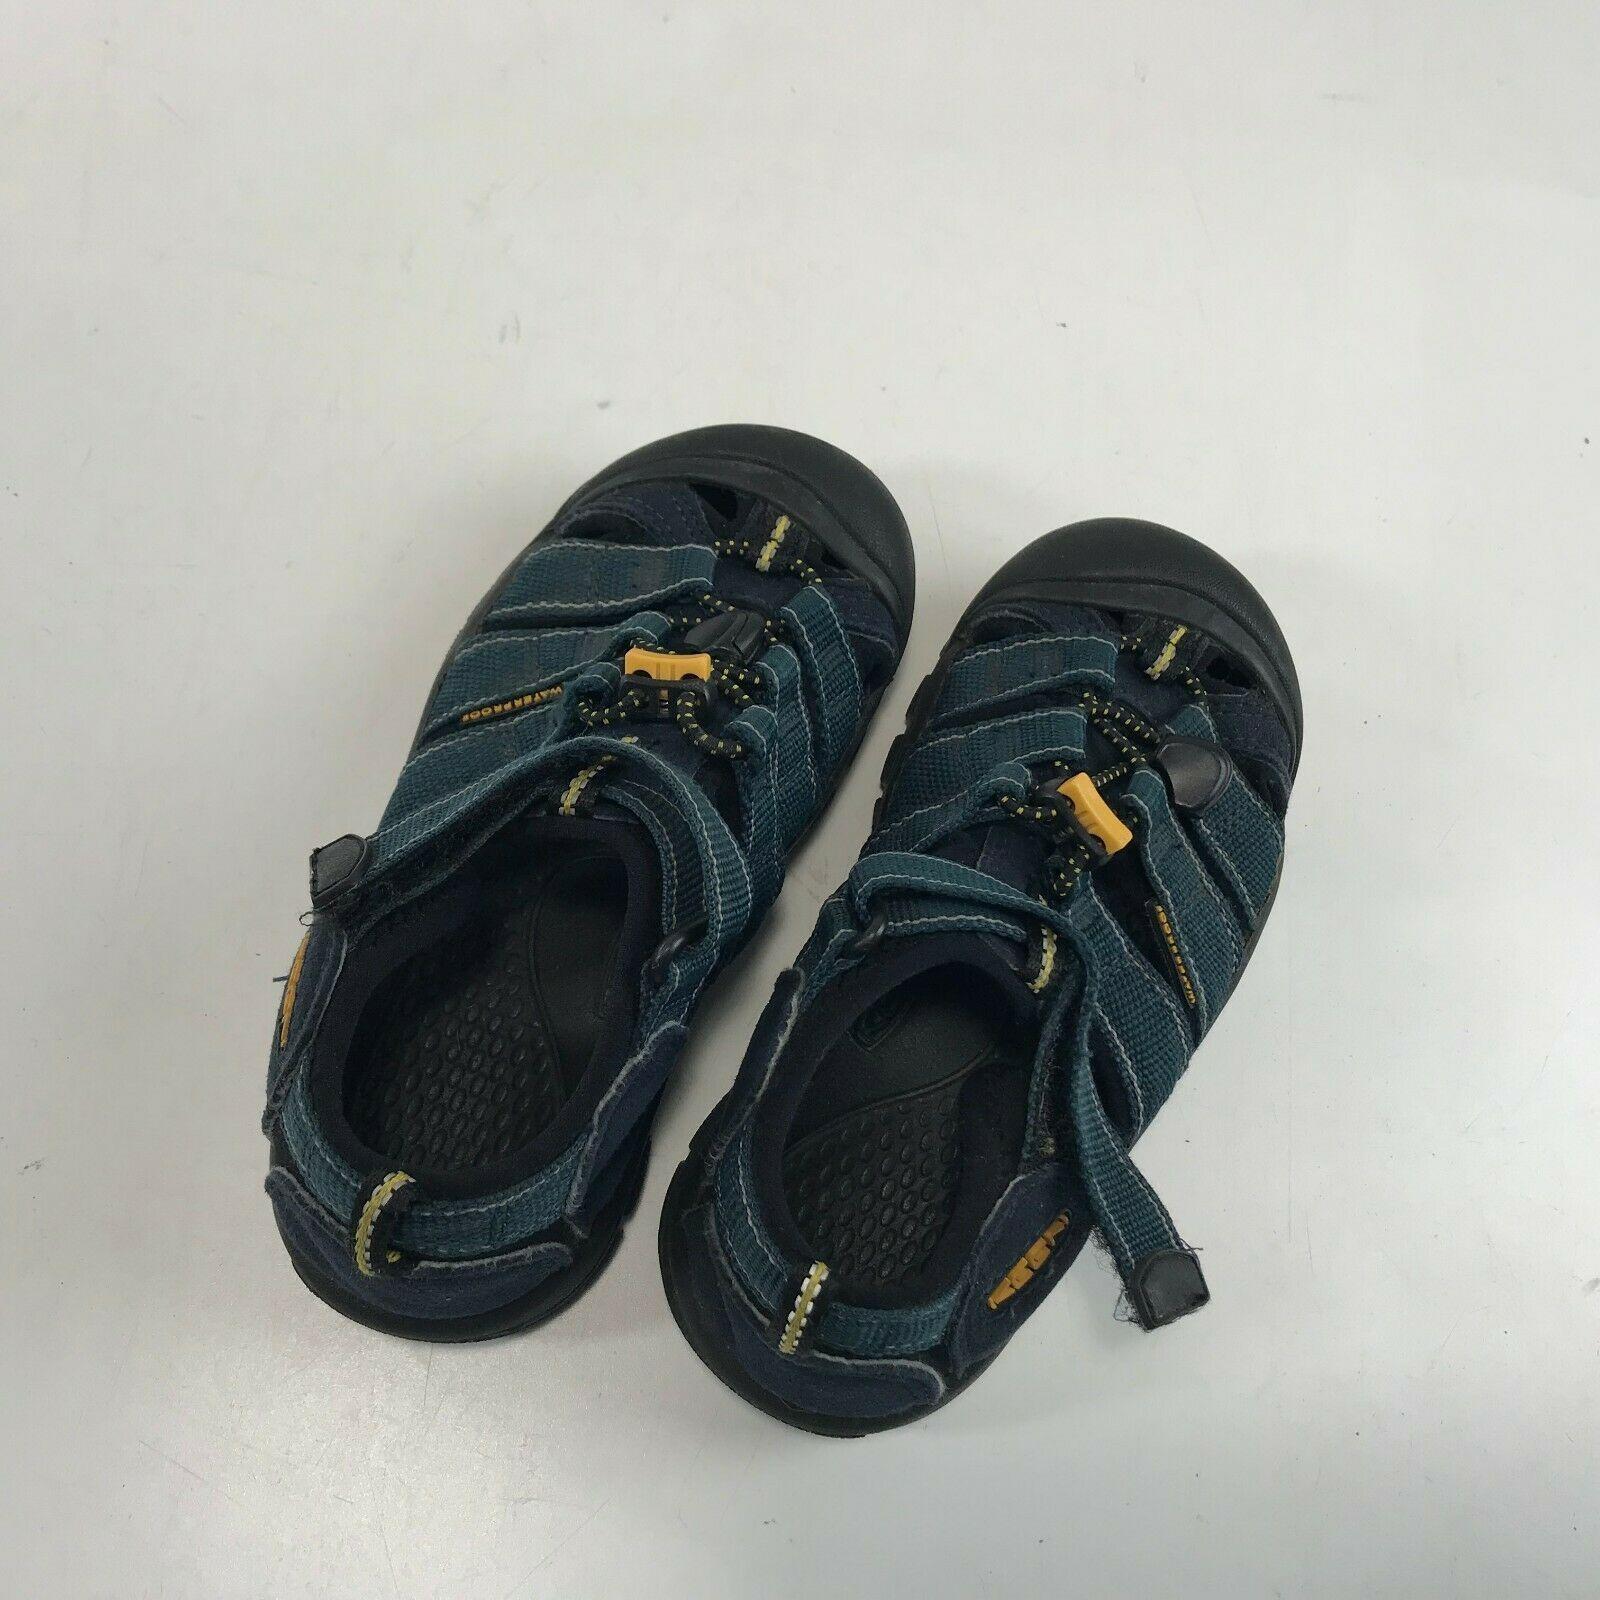 KEEN Newport Waterproof Sports Sandals Shoes Size 13 Boy Toddler image 5